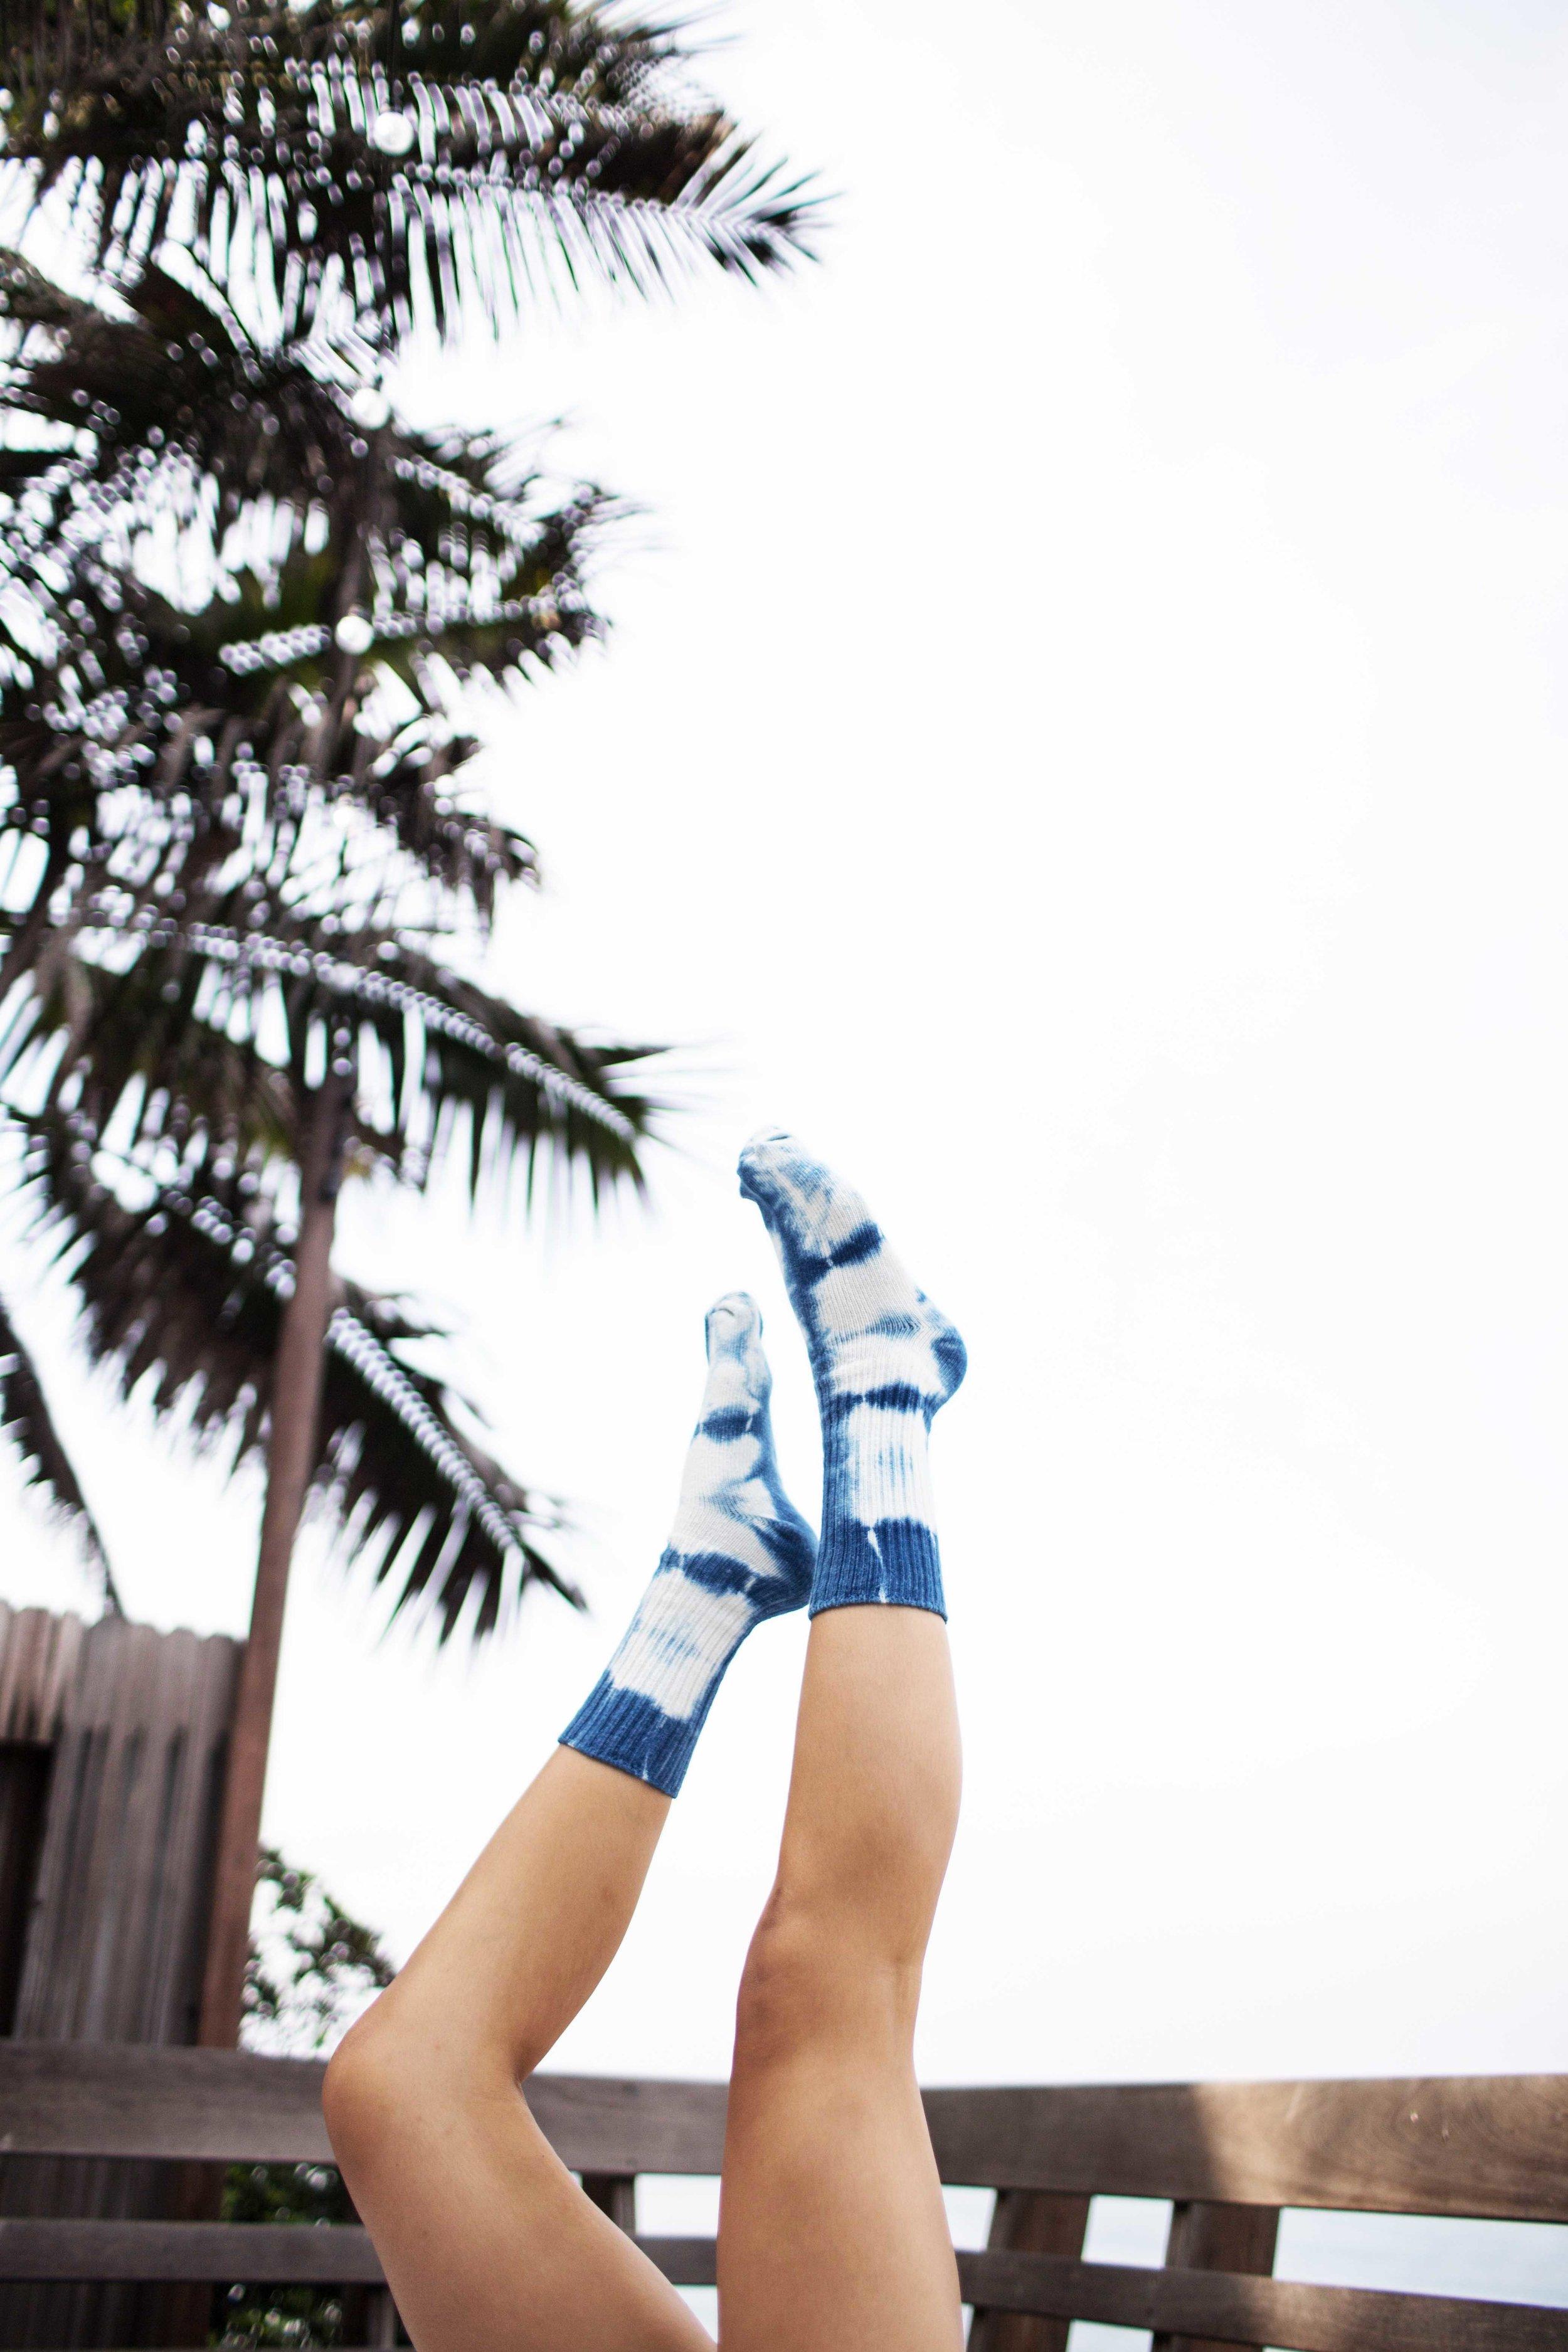 I Love Bad Indigo dyed Hemp/Organic Cotton Socks.